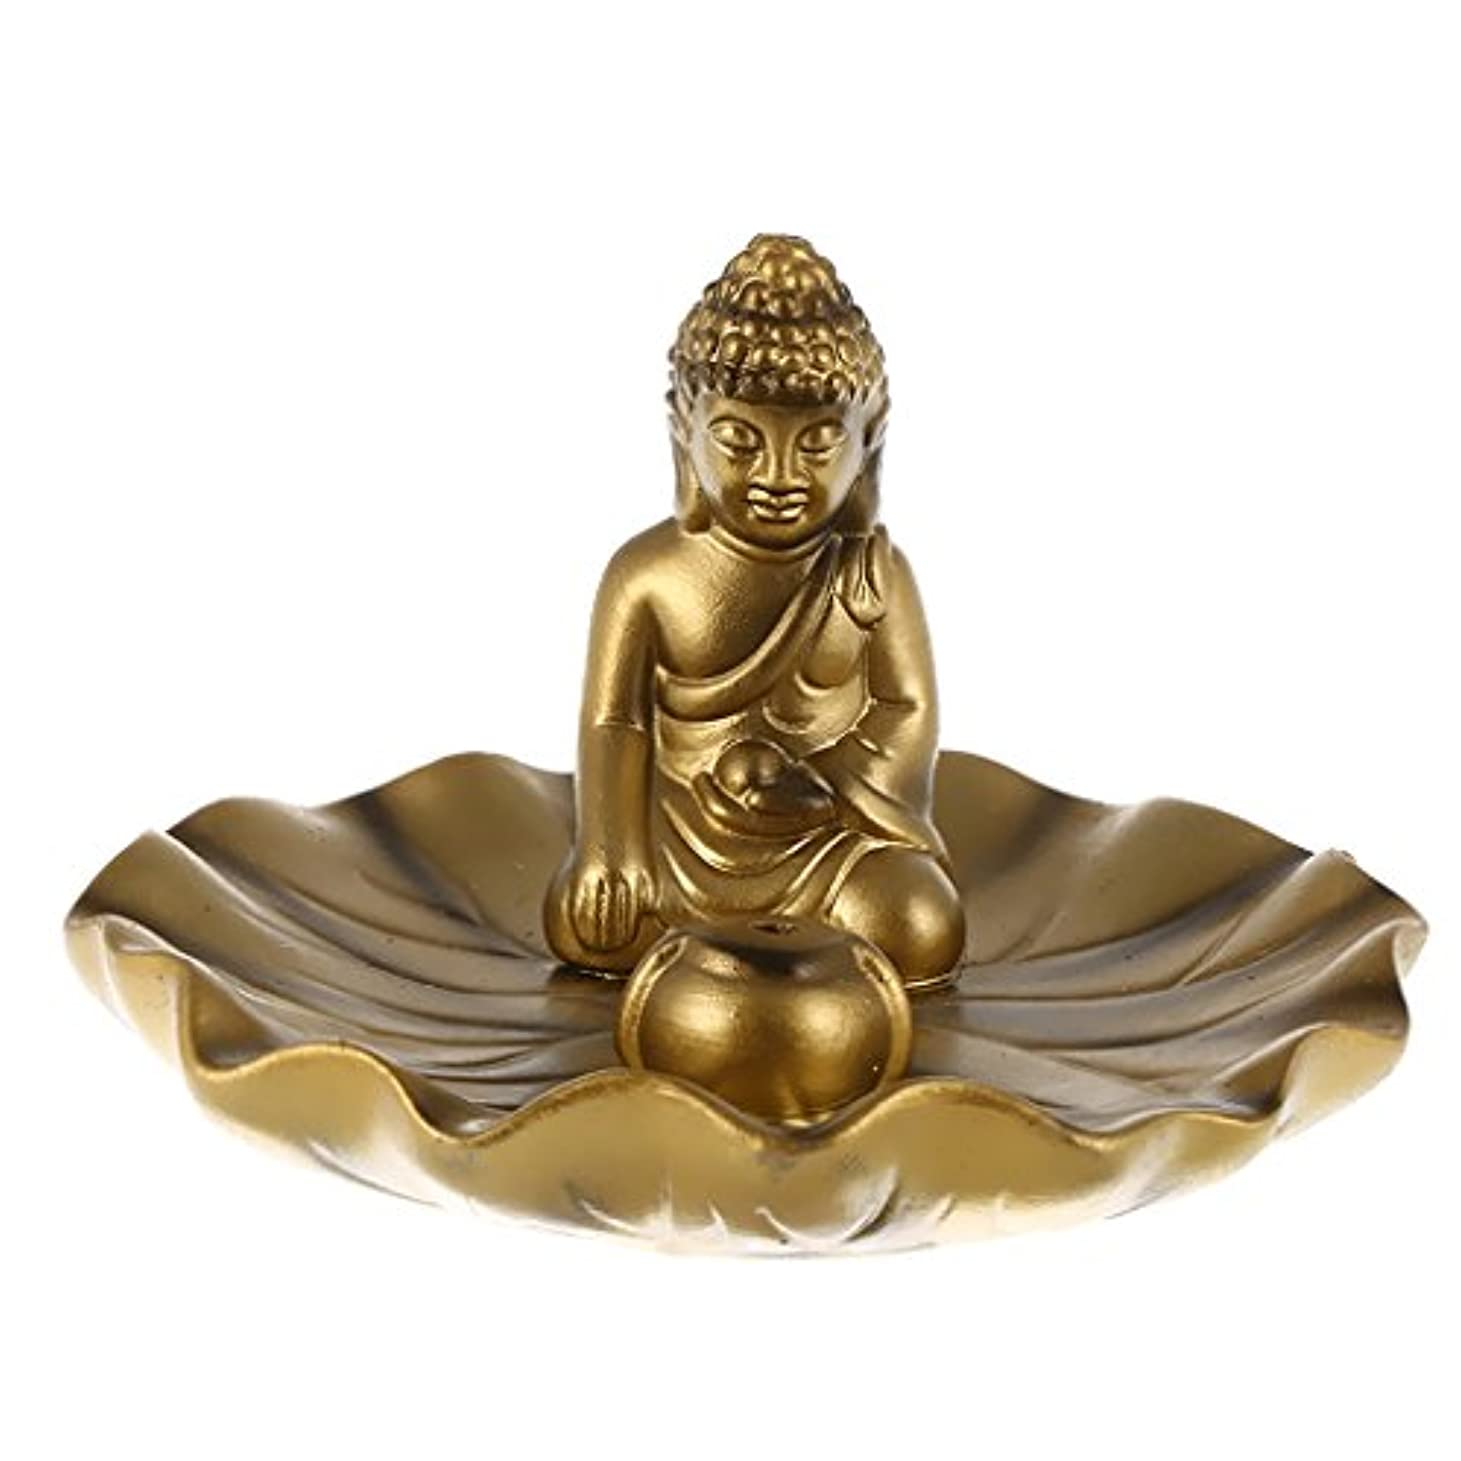 monkeyjackアンティーク中国スタイルMeditating Buddha Statue Incenseお香バーナーホルダーラウンドプレートホーム装飾 12.5x8cm ゴールド 451abb99ca509582d1ac598f12cb379e